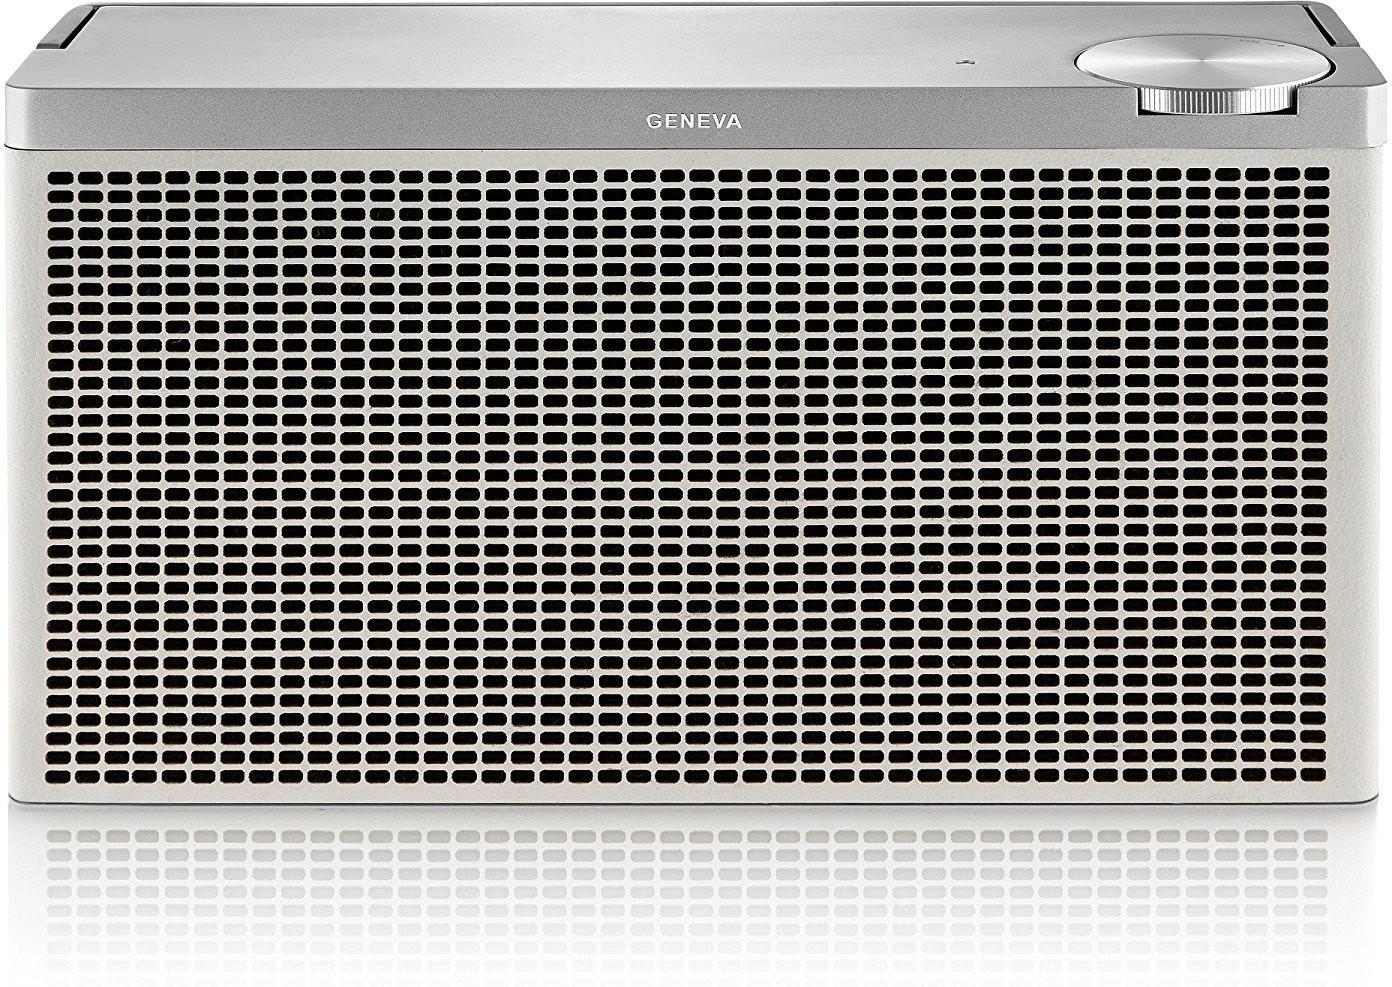 Image of Geneva Touring/M white